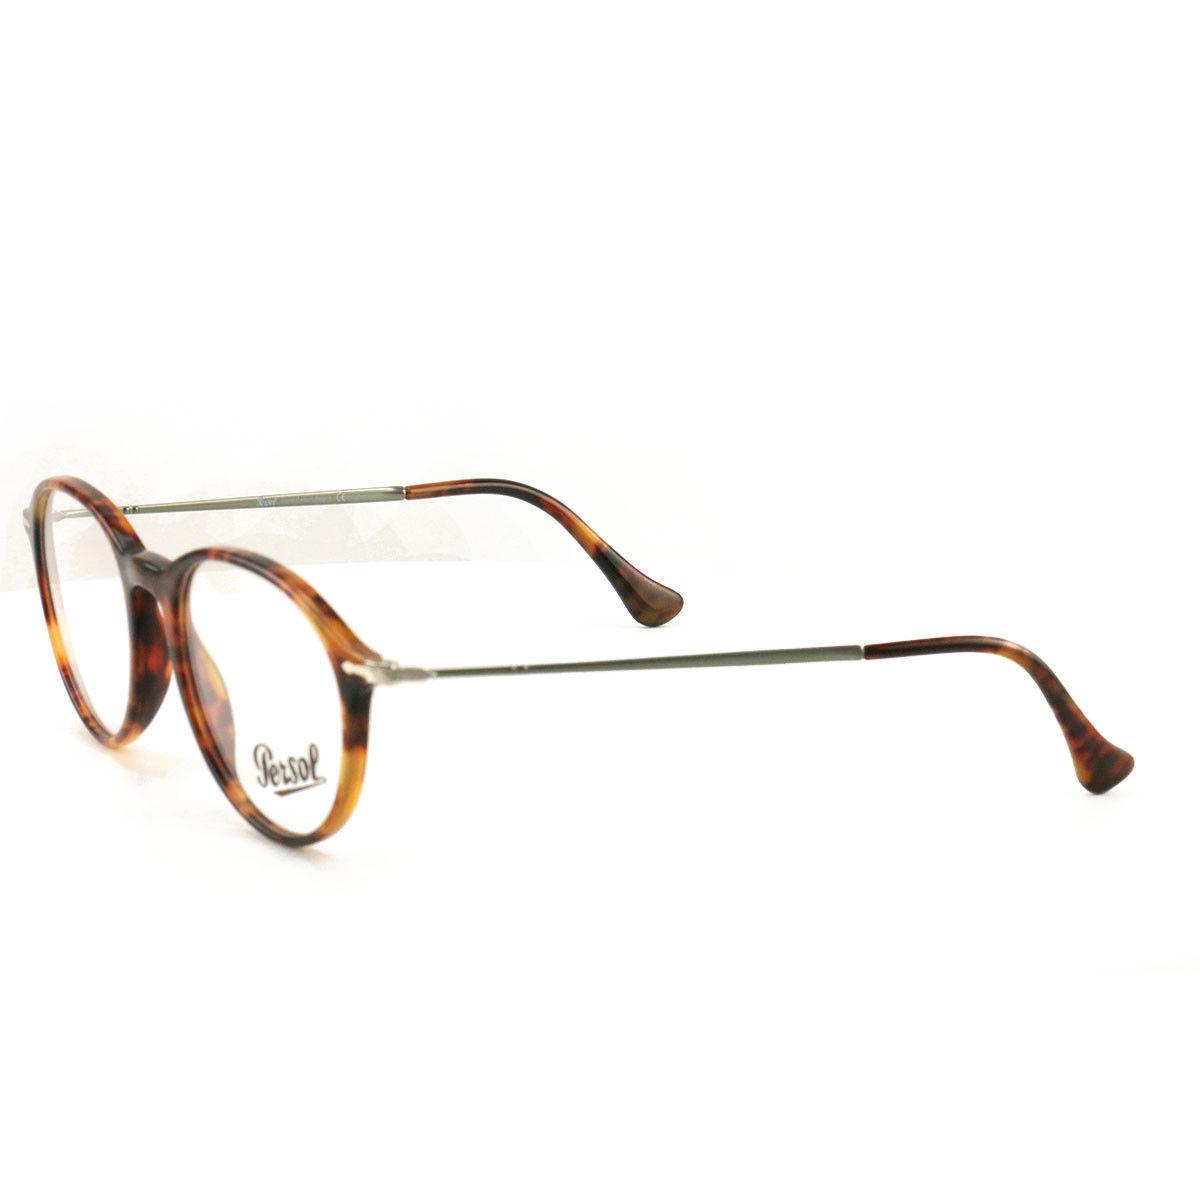 58405b1775b Persol Eyeglasses PO3125V 108 51MM Havana and 27 similar items